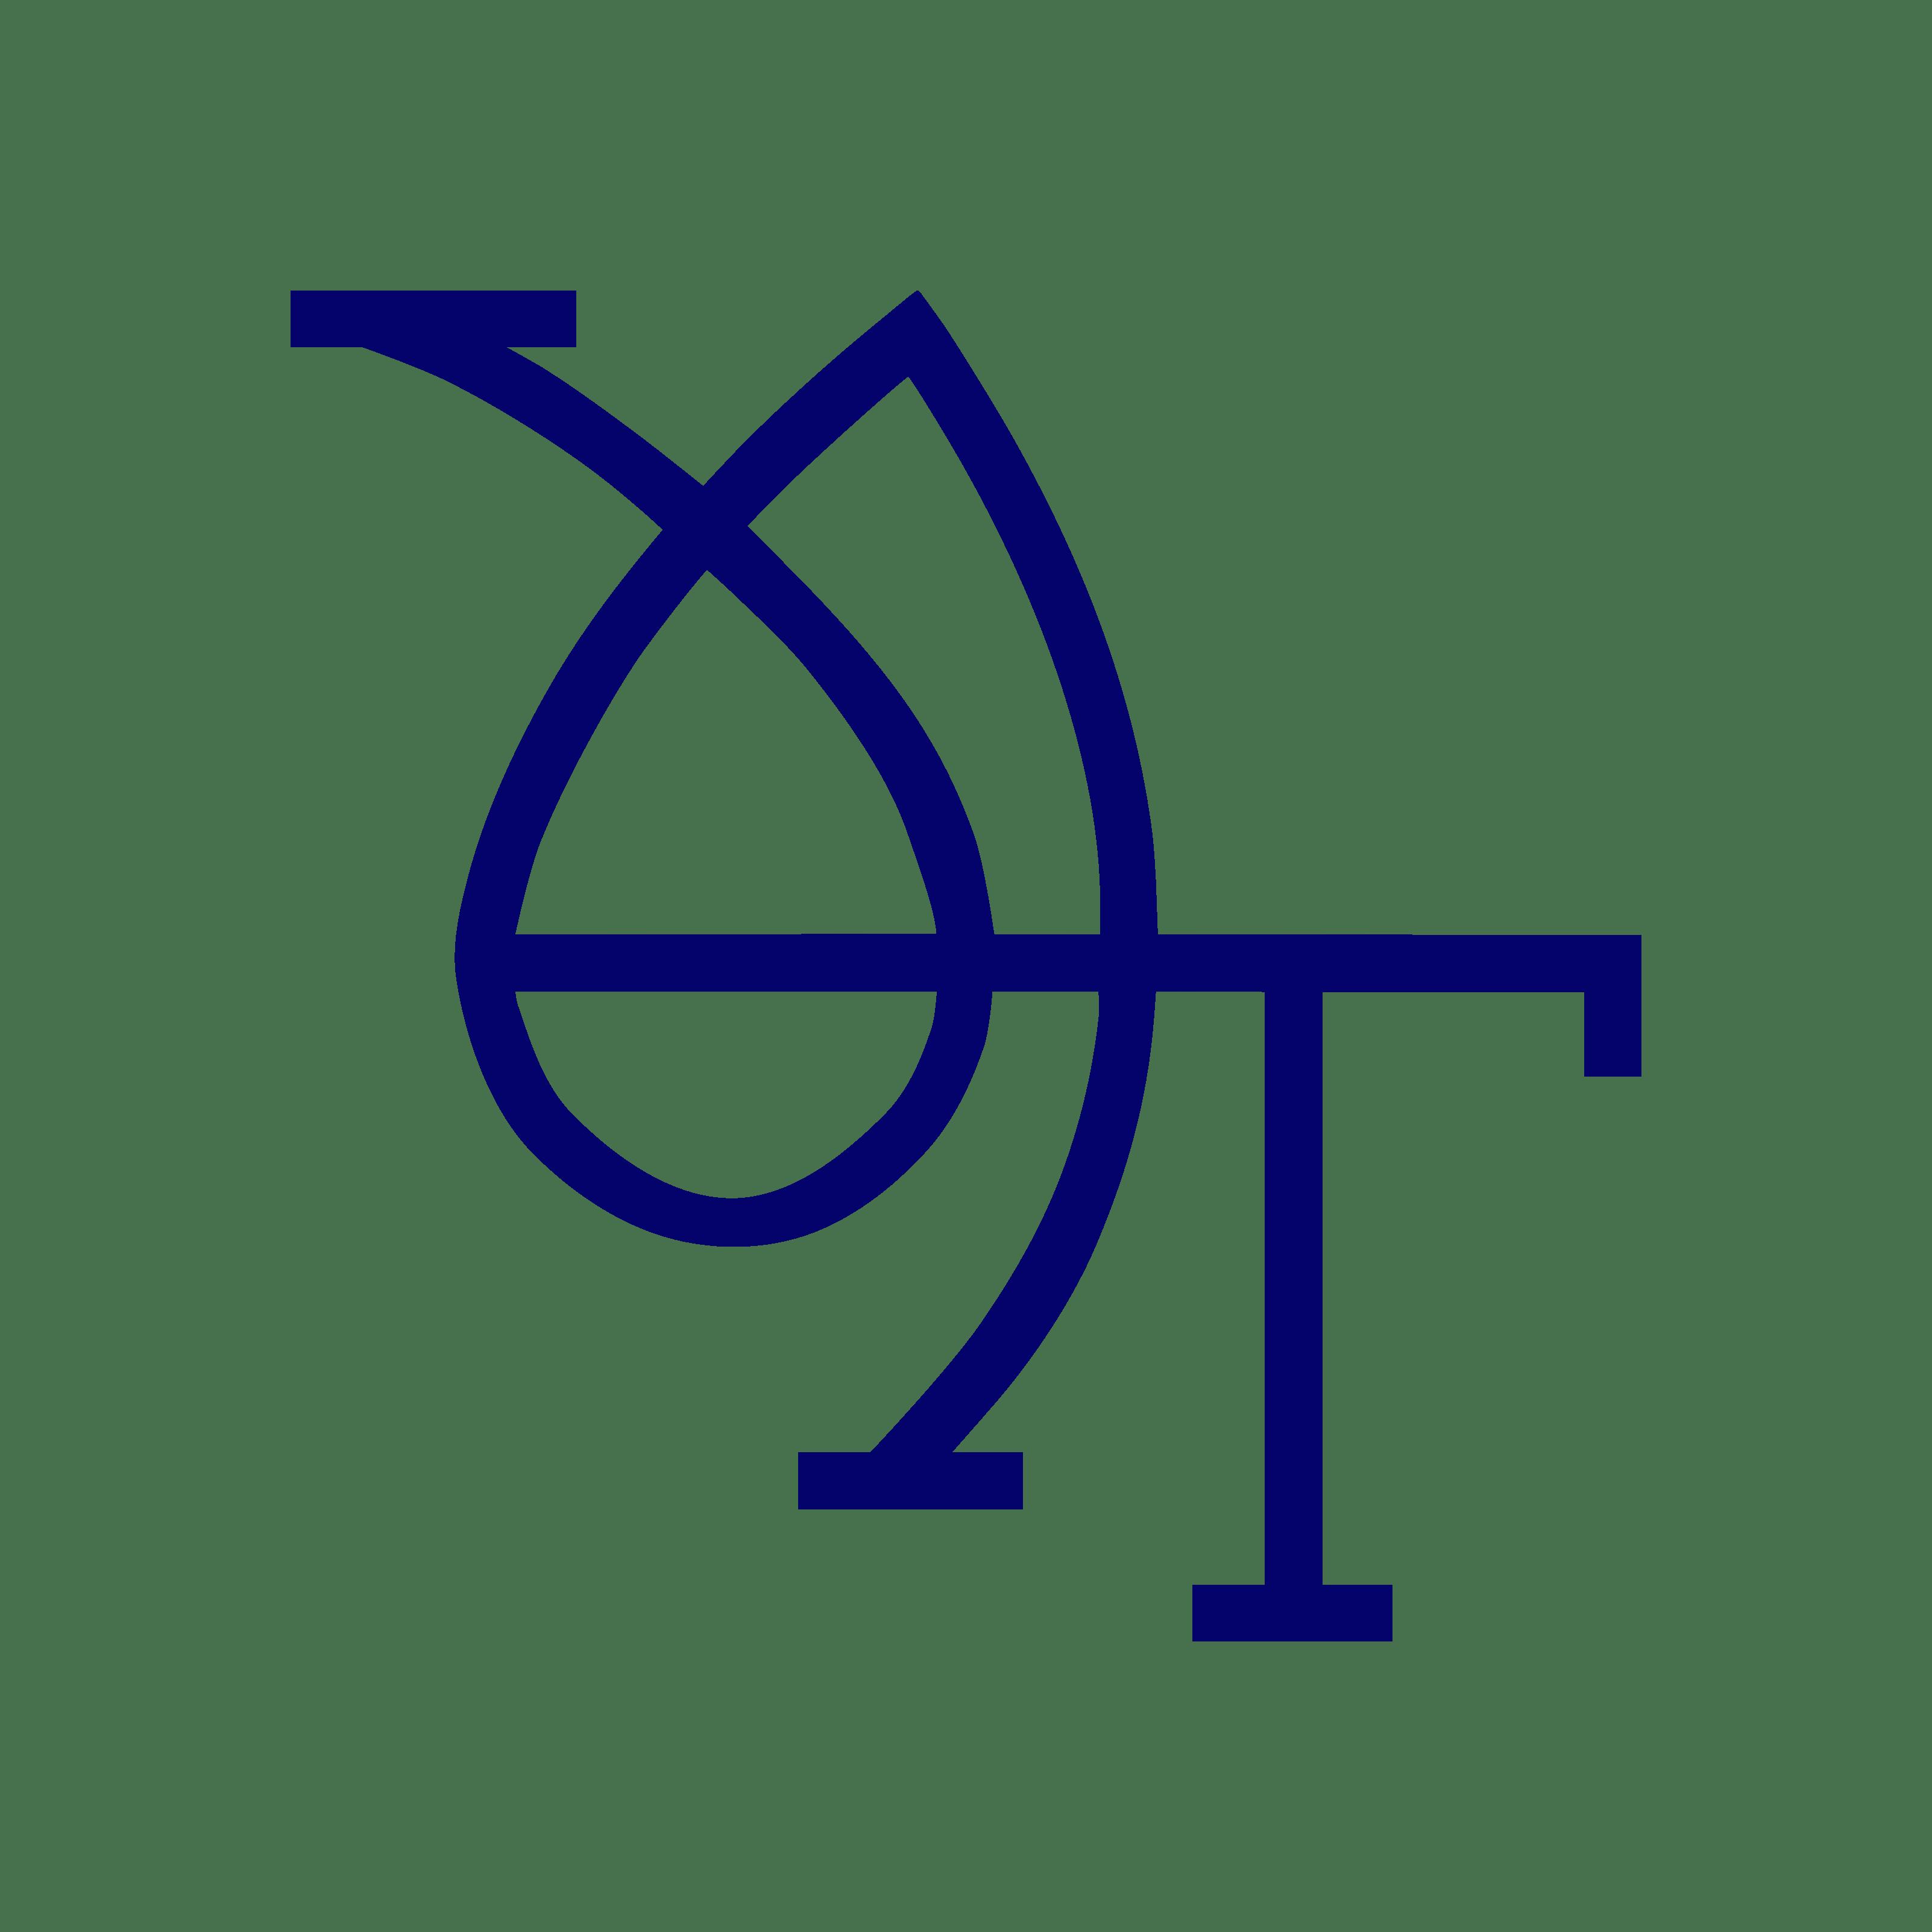 Alpha Theta insignia